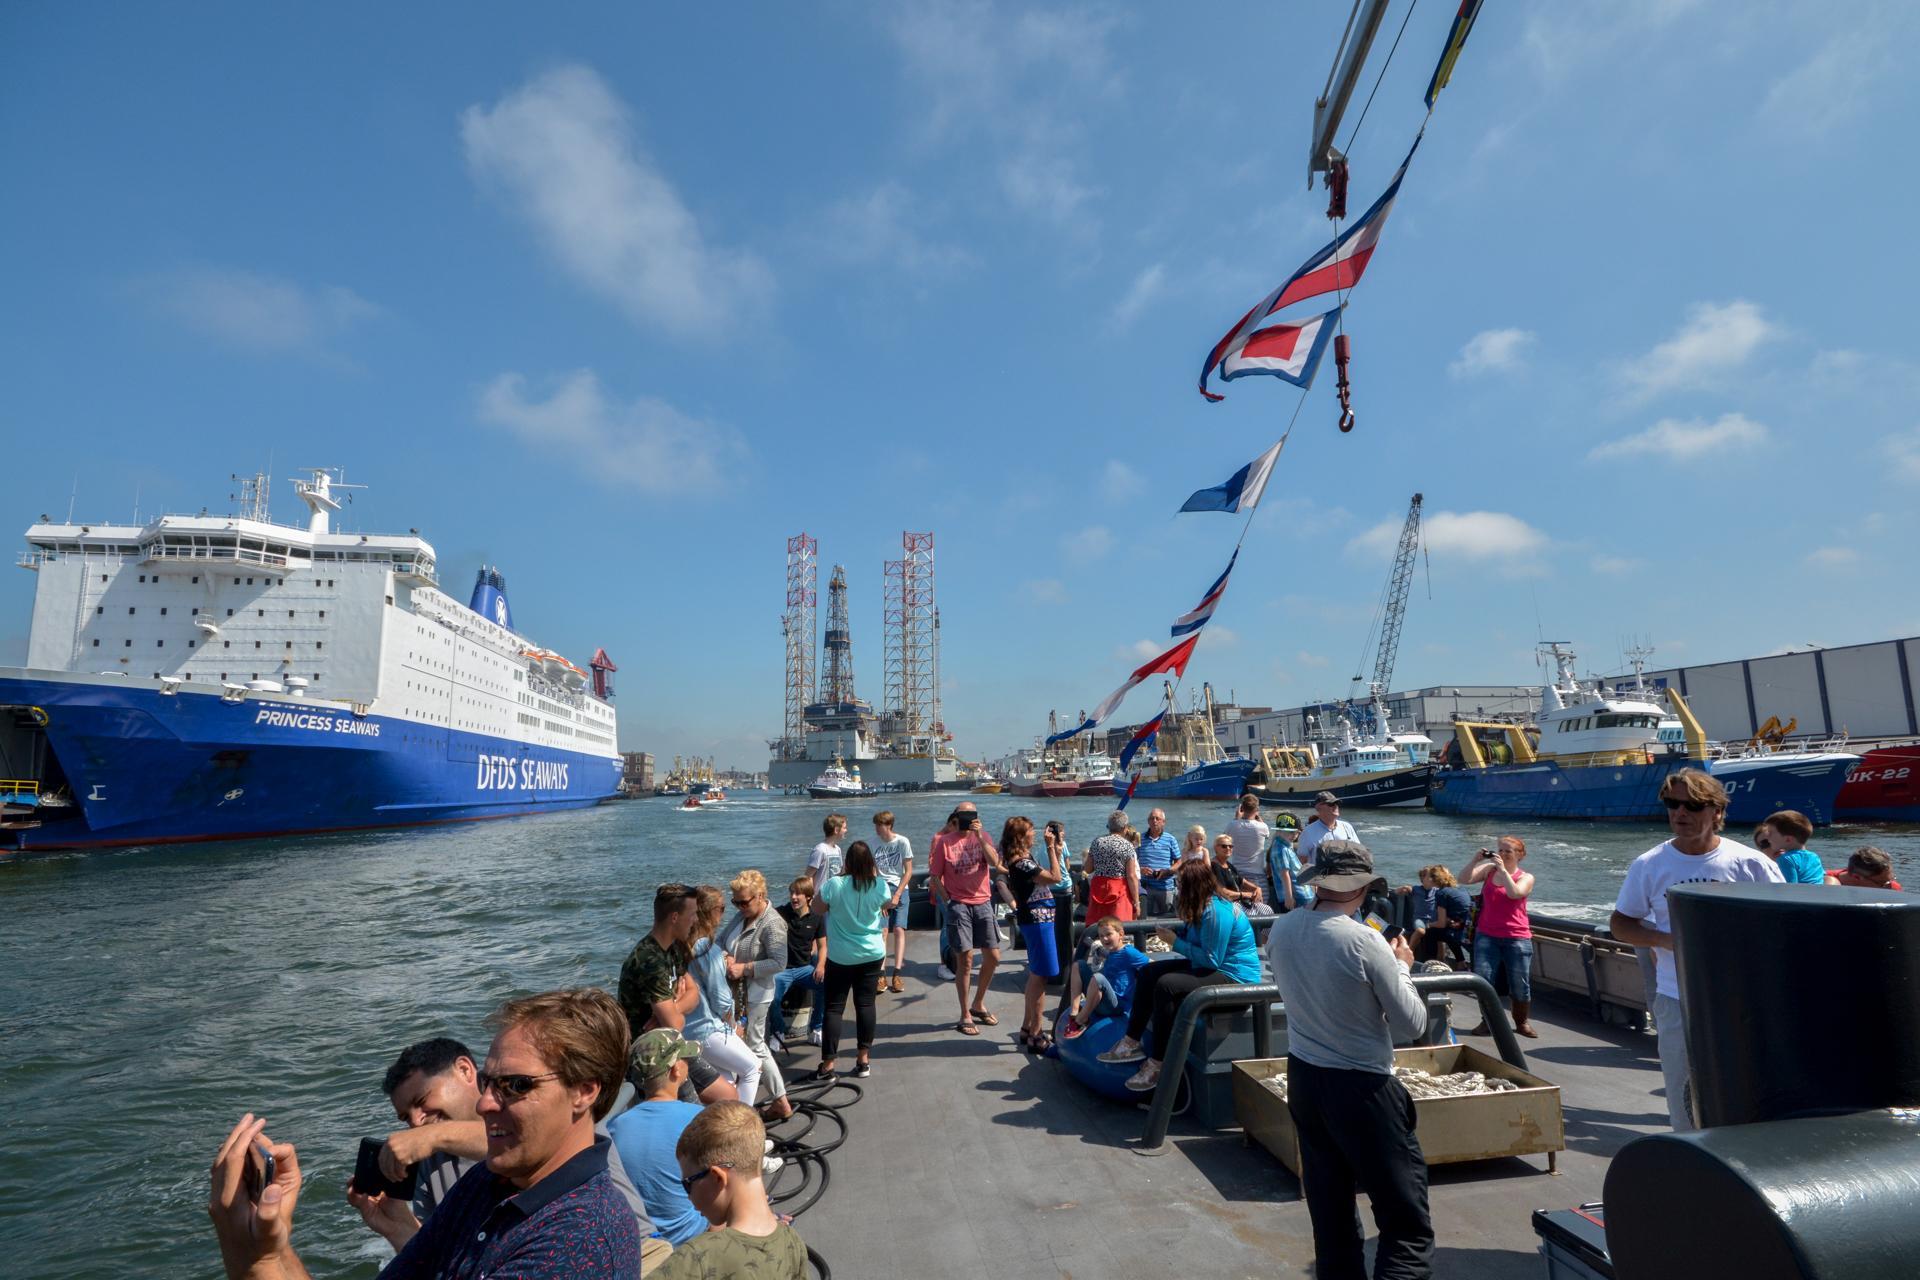 Organisatie verwacht 25.000 mensen op Havenfestival in IJmuiden komend weekeinde